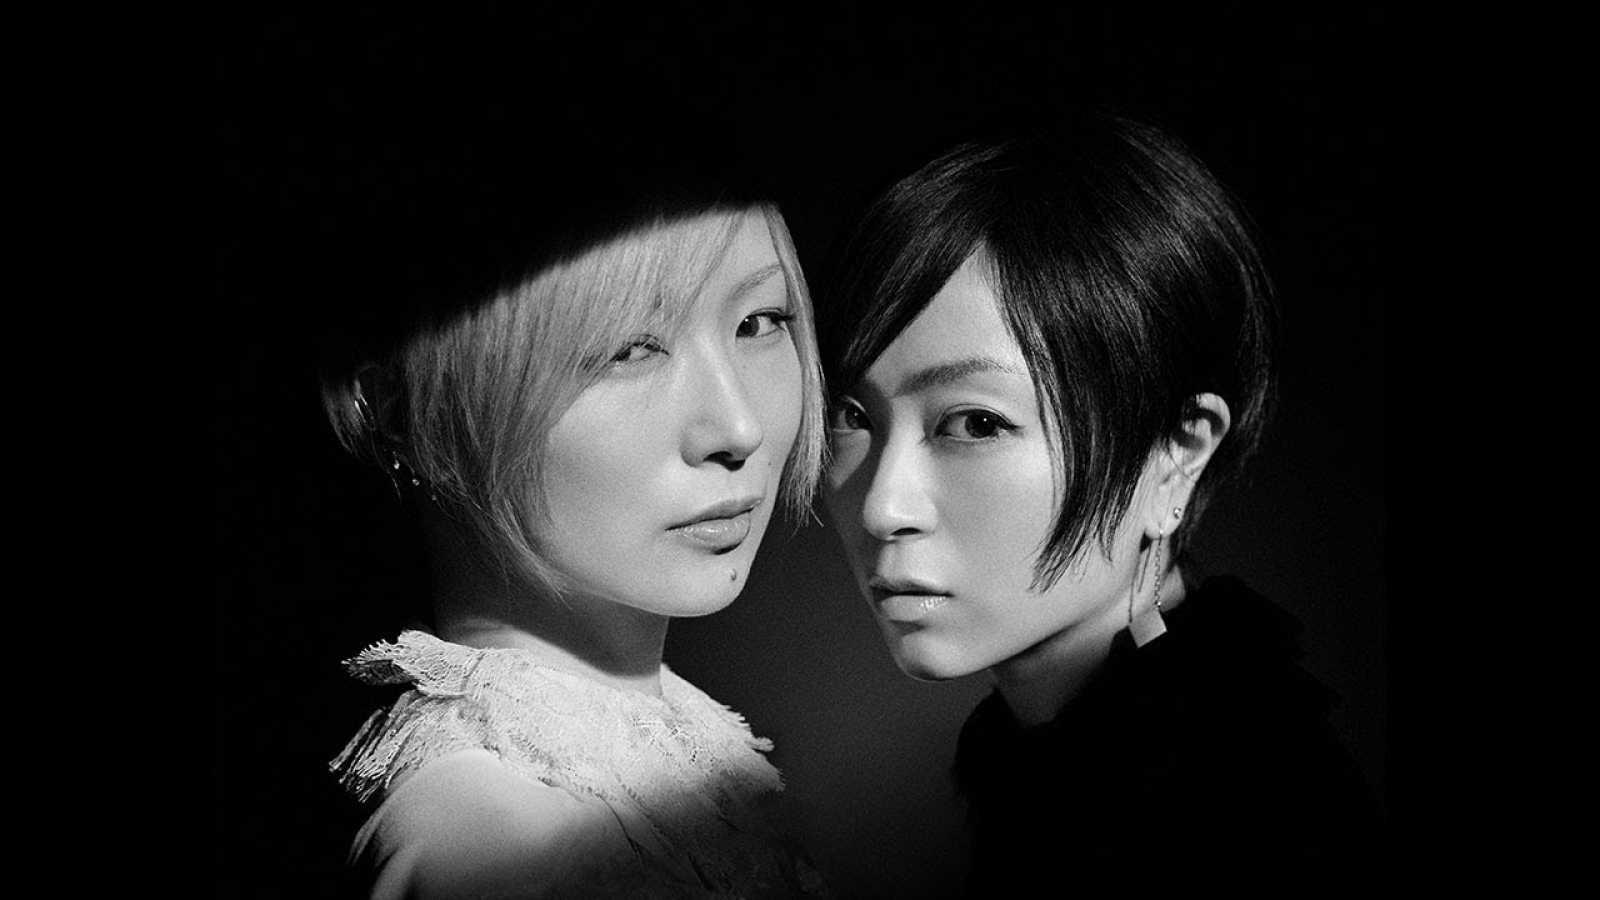 Sheena Ringo revela su dueto con Utada Hikaru © kronekodow. All rights reserved.